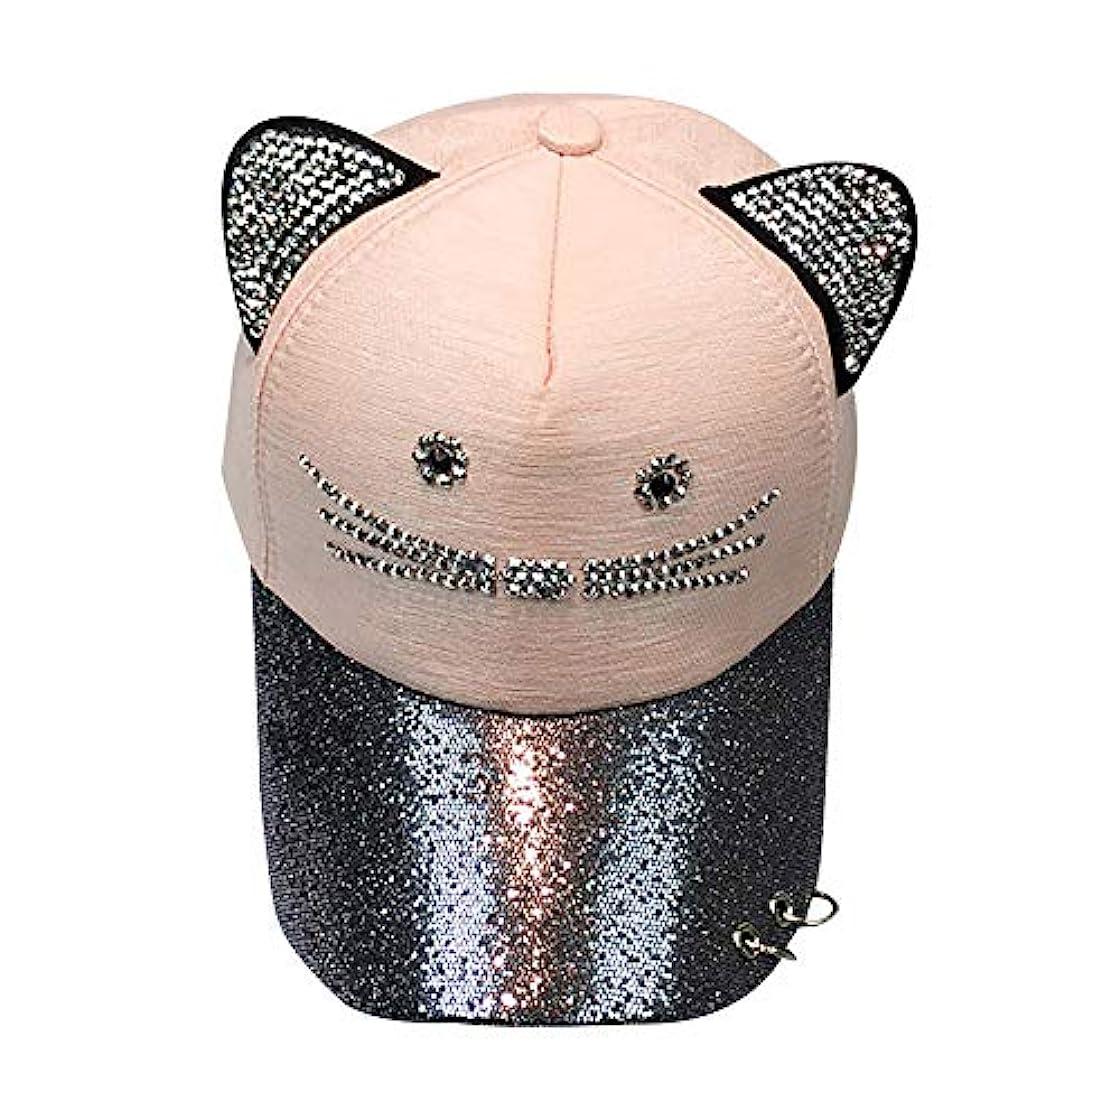 Racazing Cap 野球帽 ヒップホップ メンズ 男女兼用 夏 登山 帽子スパンコール 可調整可能 プラスベルベット 棒球帽 UV 帽子 軽量 屋外 Unisex Hat